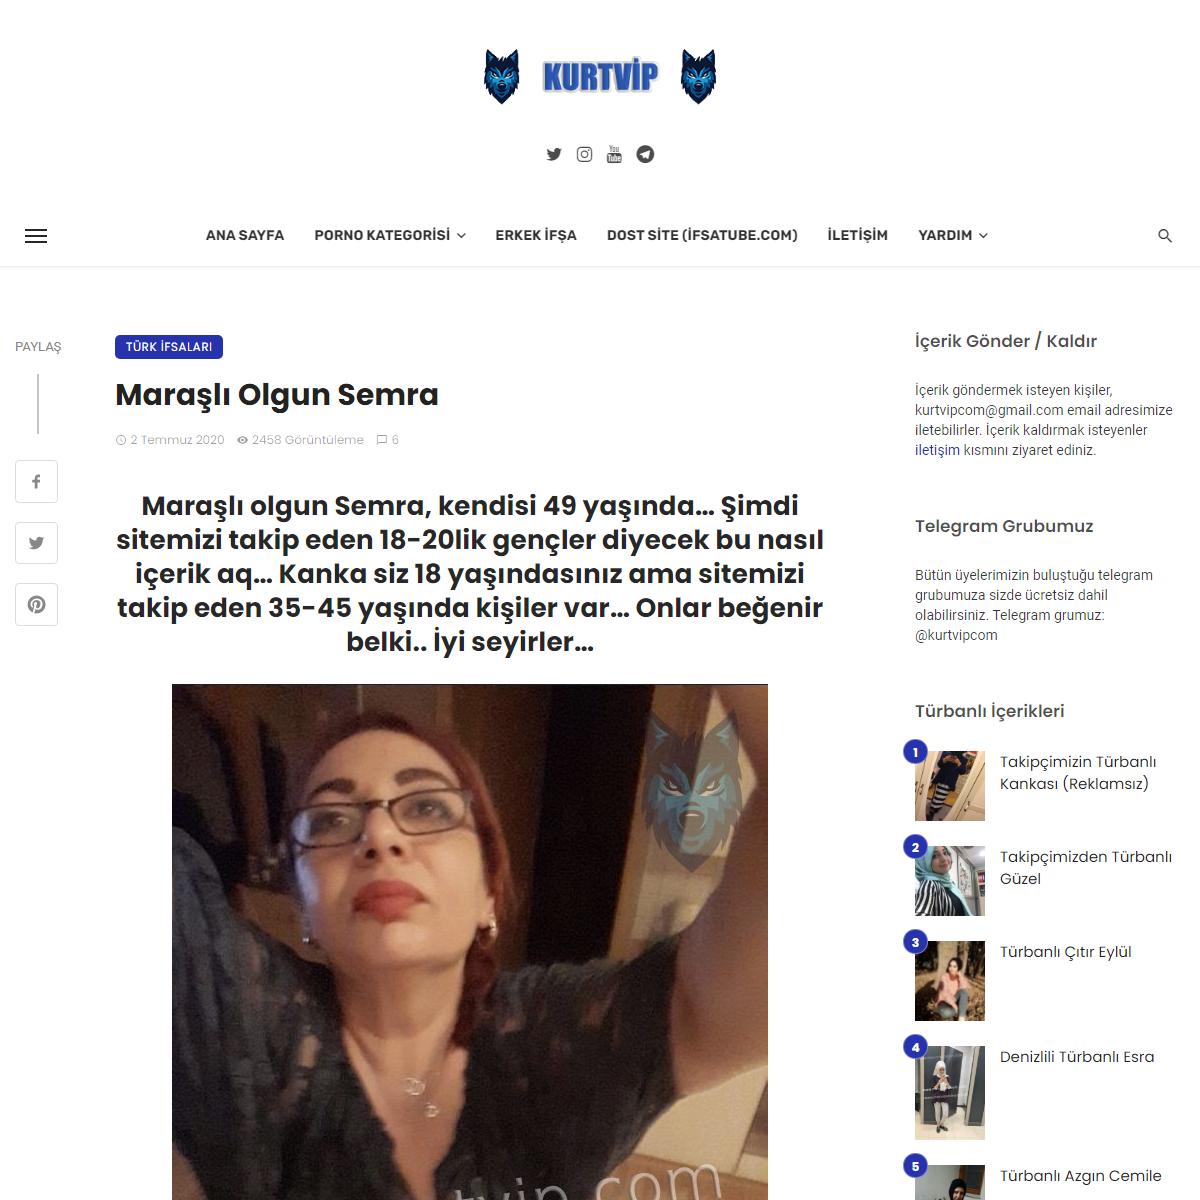 Maraşlı Olgun Semra - Kurtvip - Yabanci - Turk İfsa